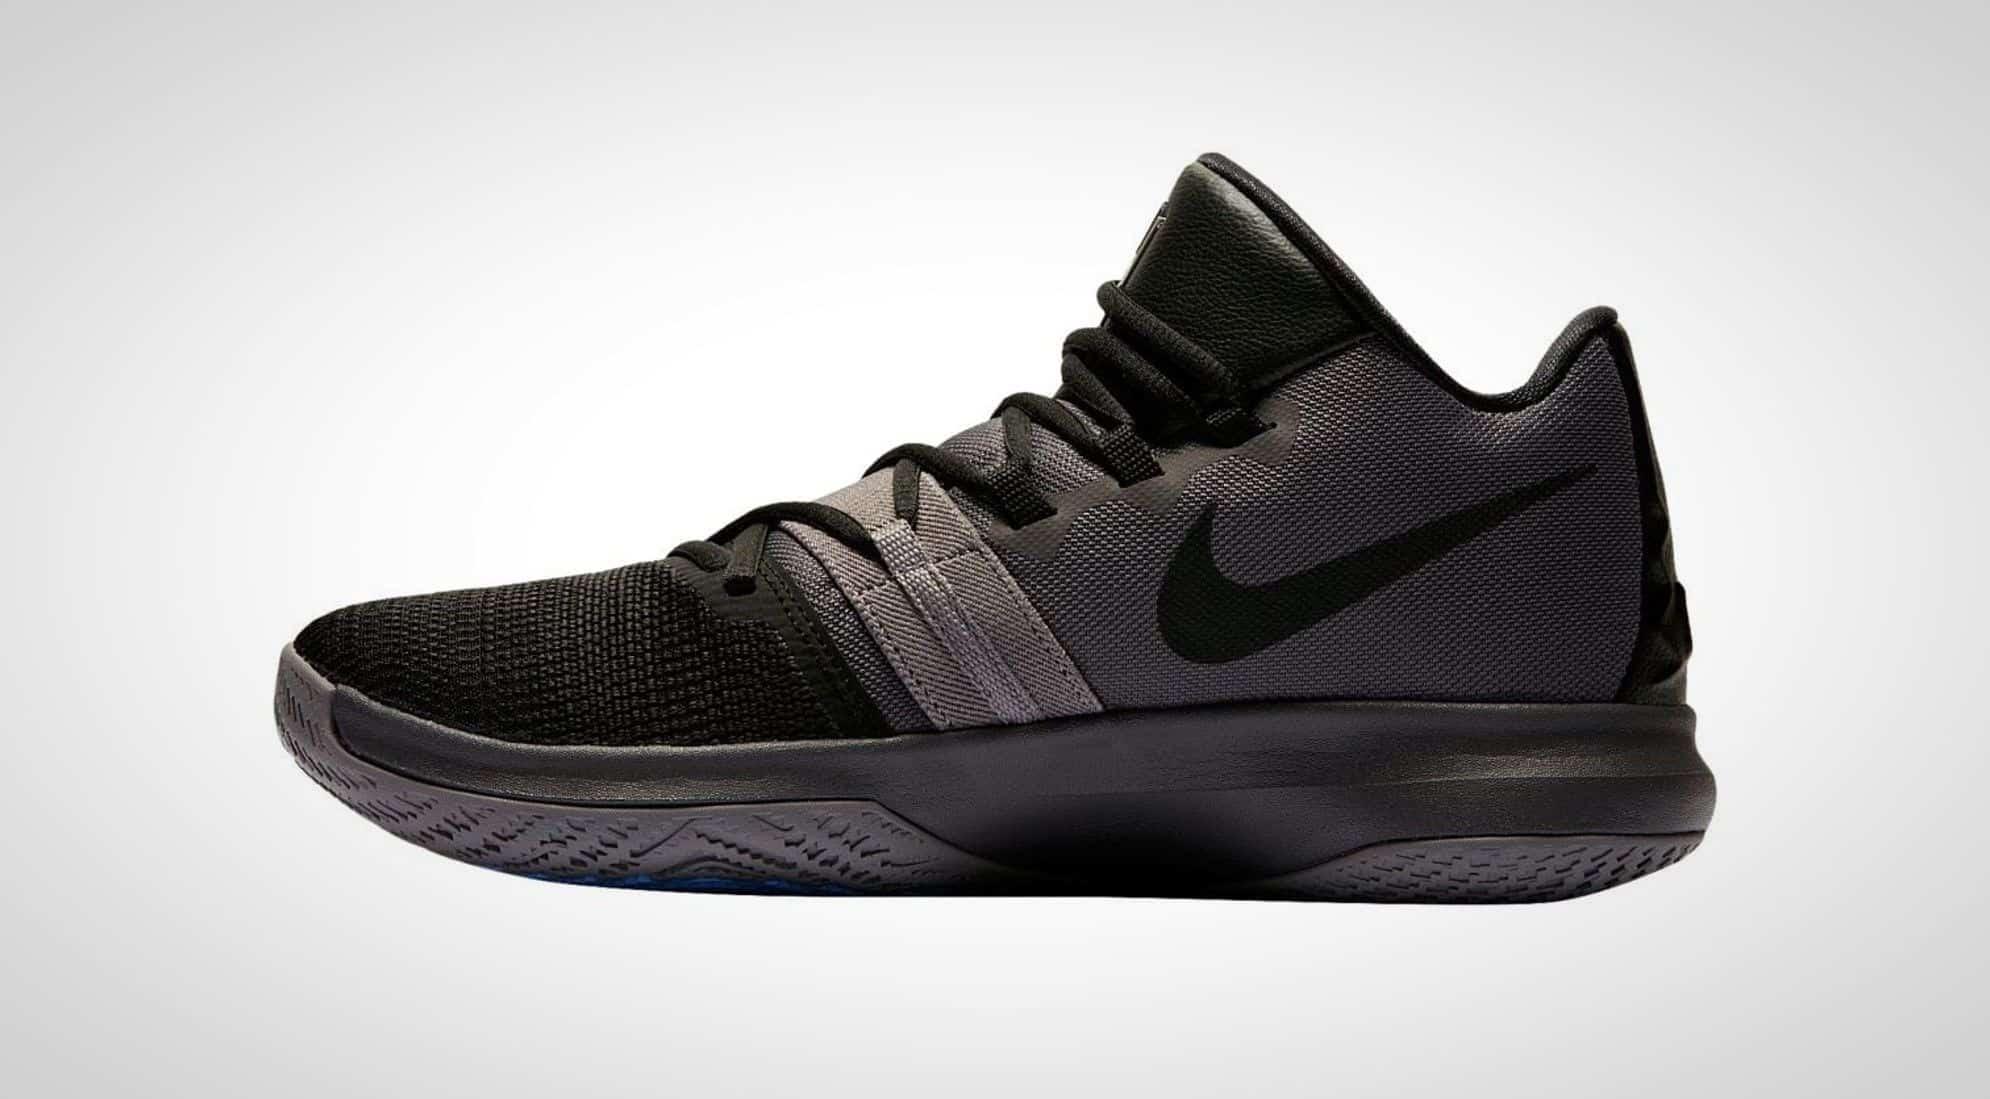 afc945d64a1d Nike Kyrie Flytrap Shoe Review - BestOutdoorBasketball